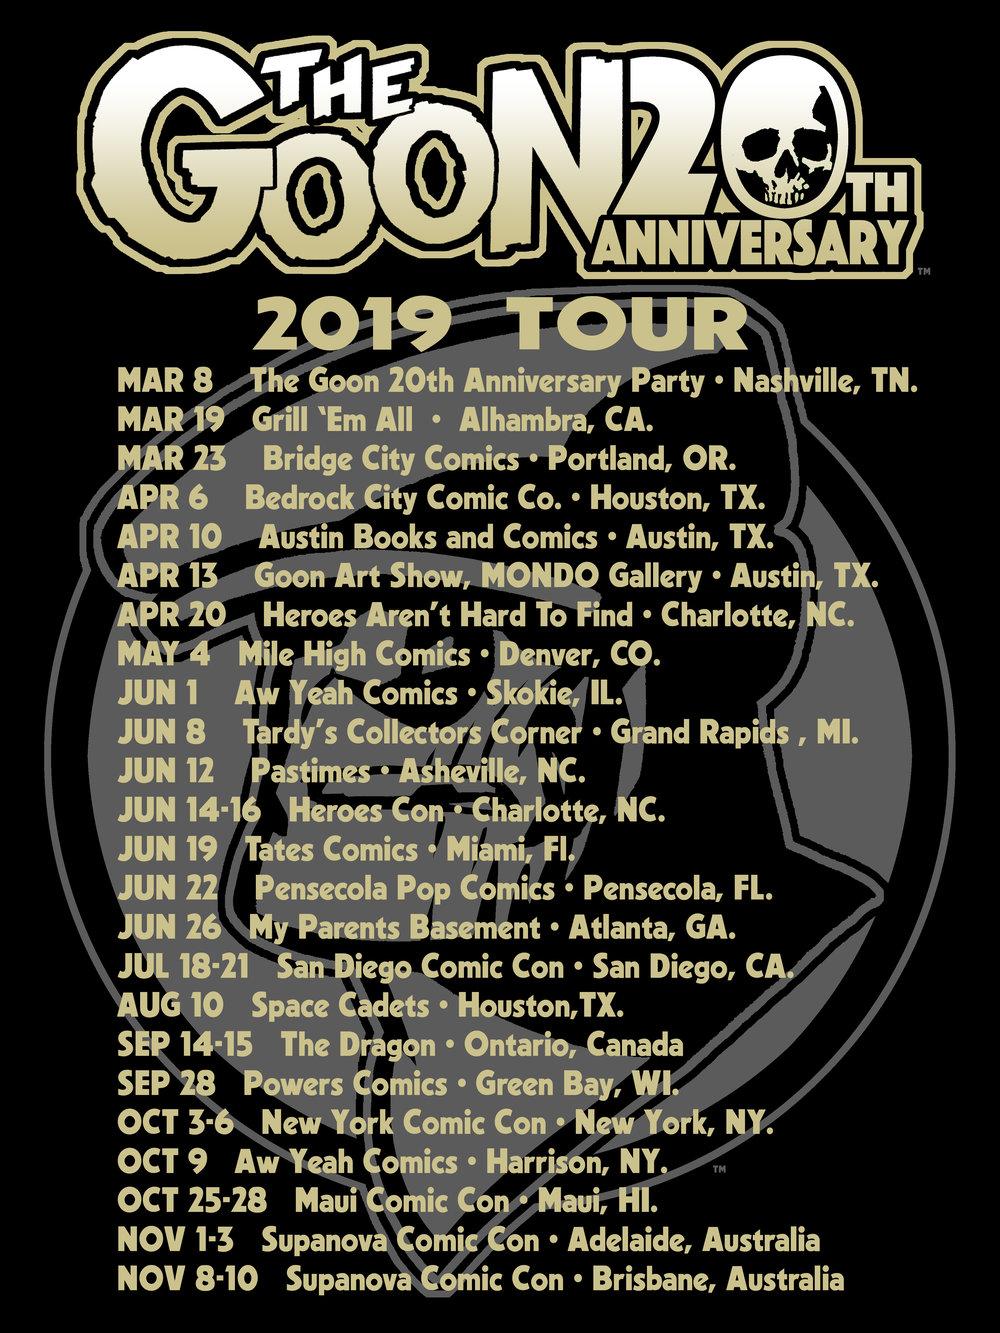 GOON_2019_TOUR.jpg